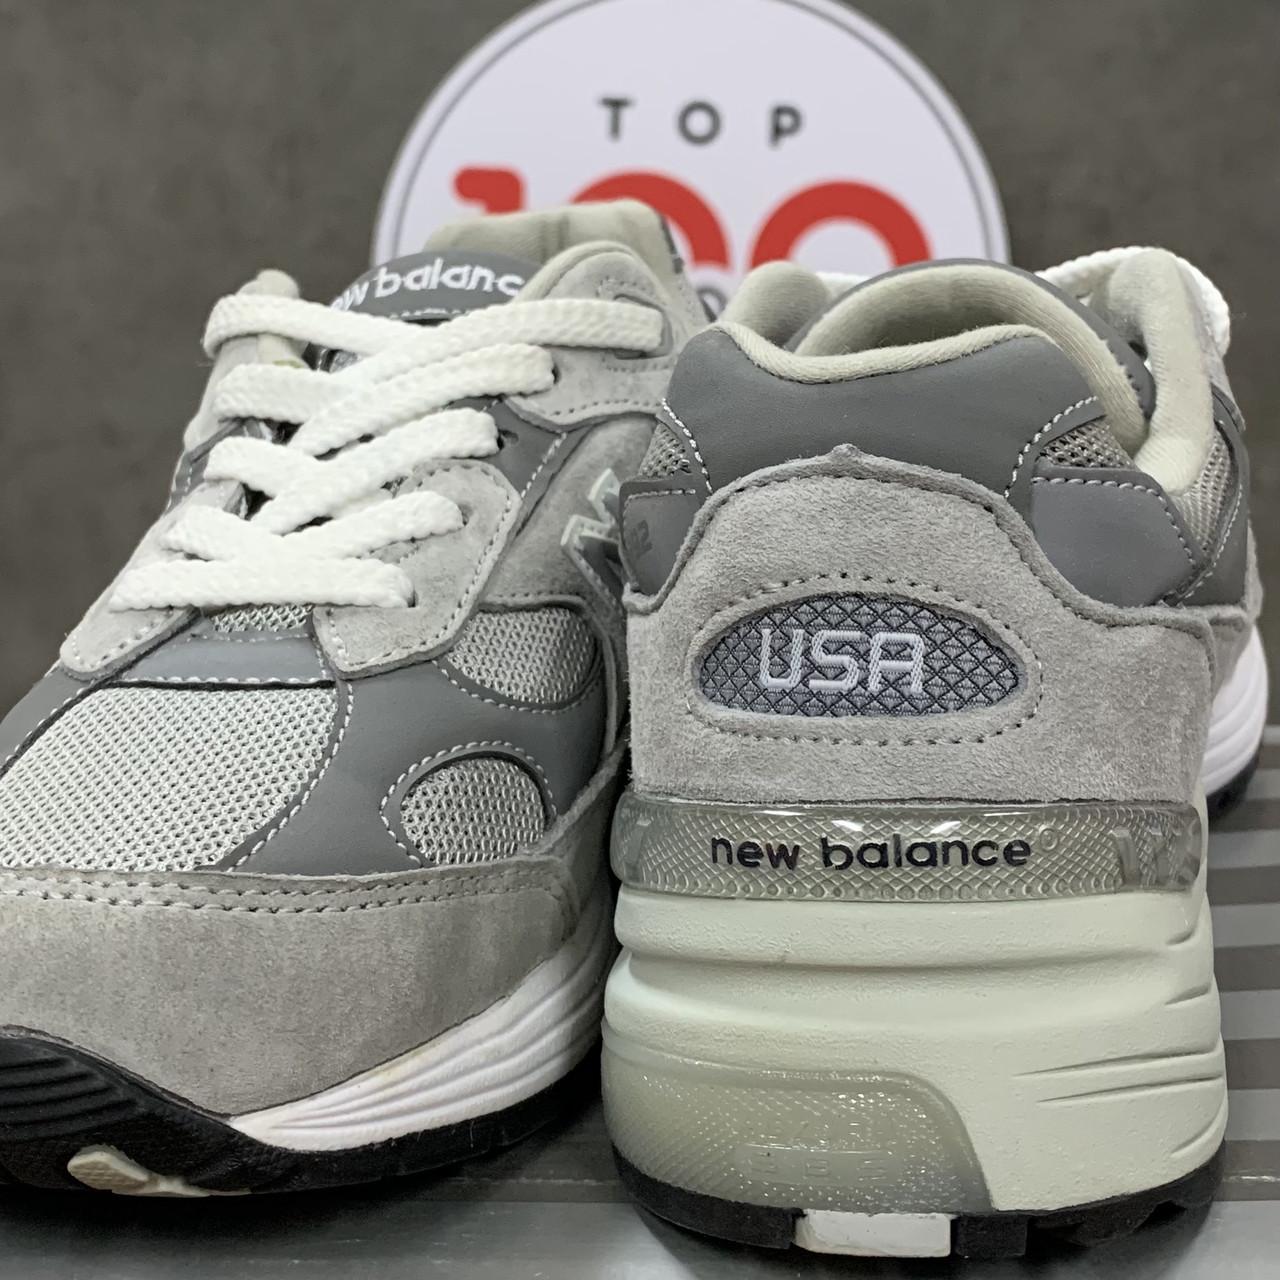 Кроссовки New Balance 992 - фото 3